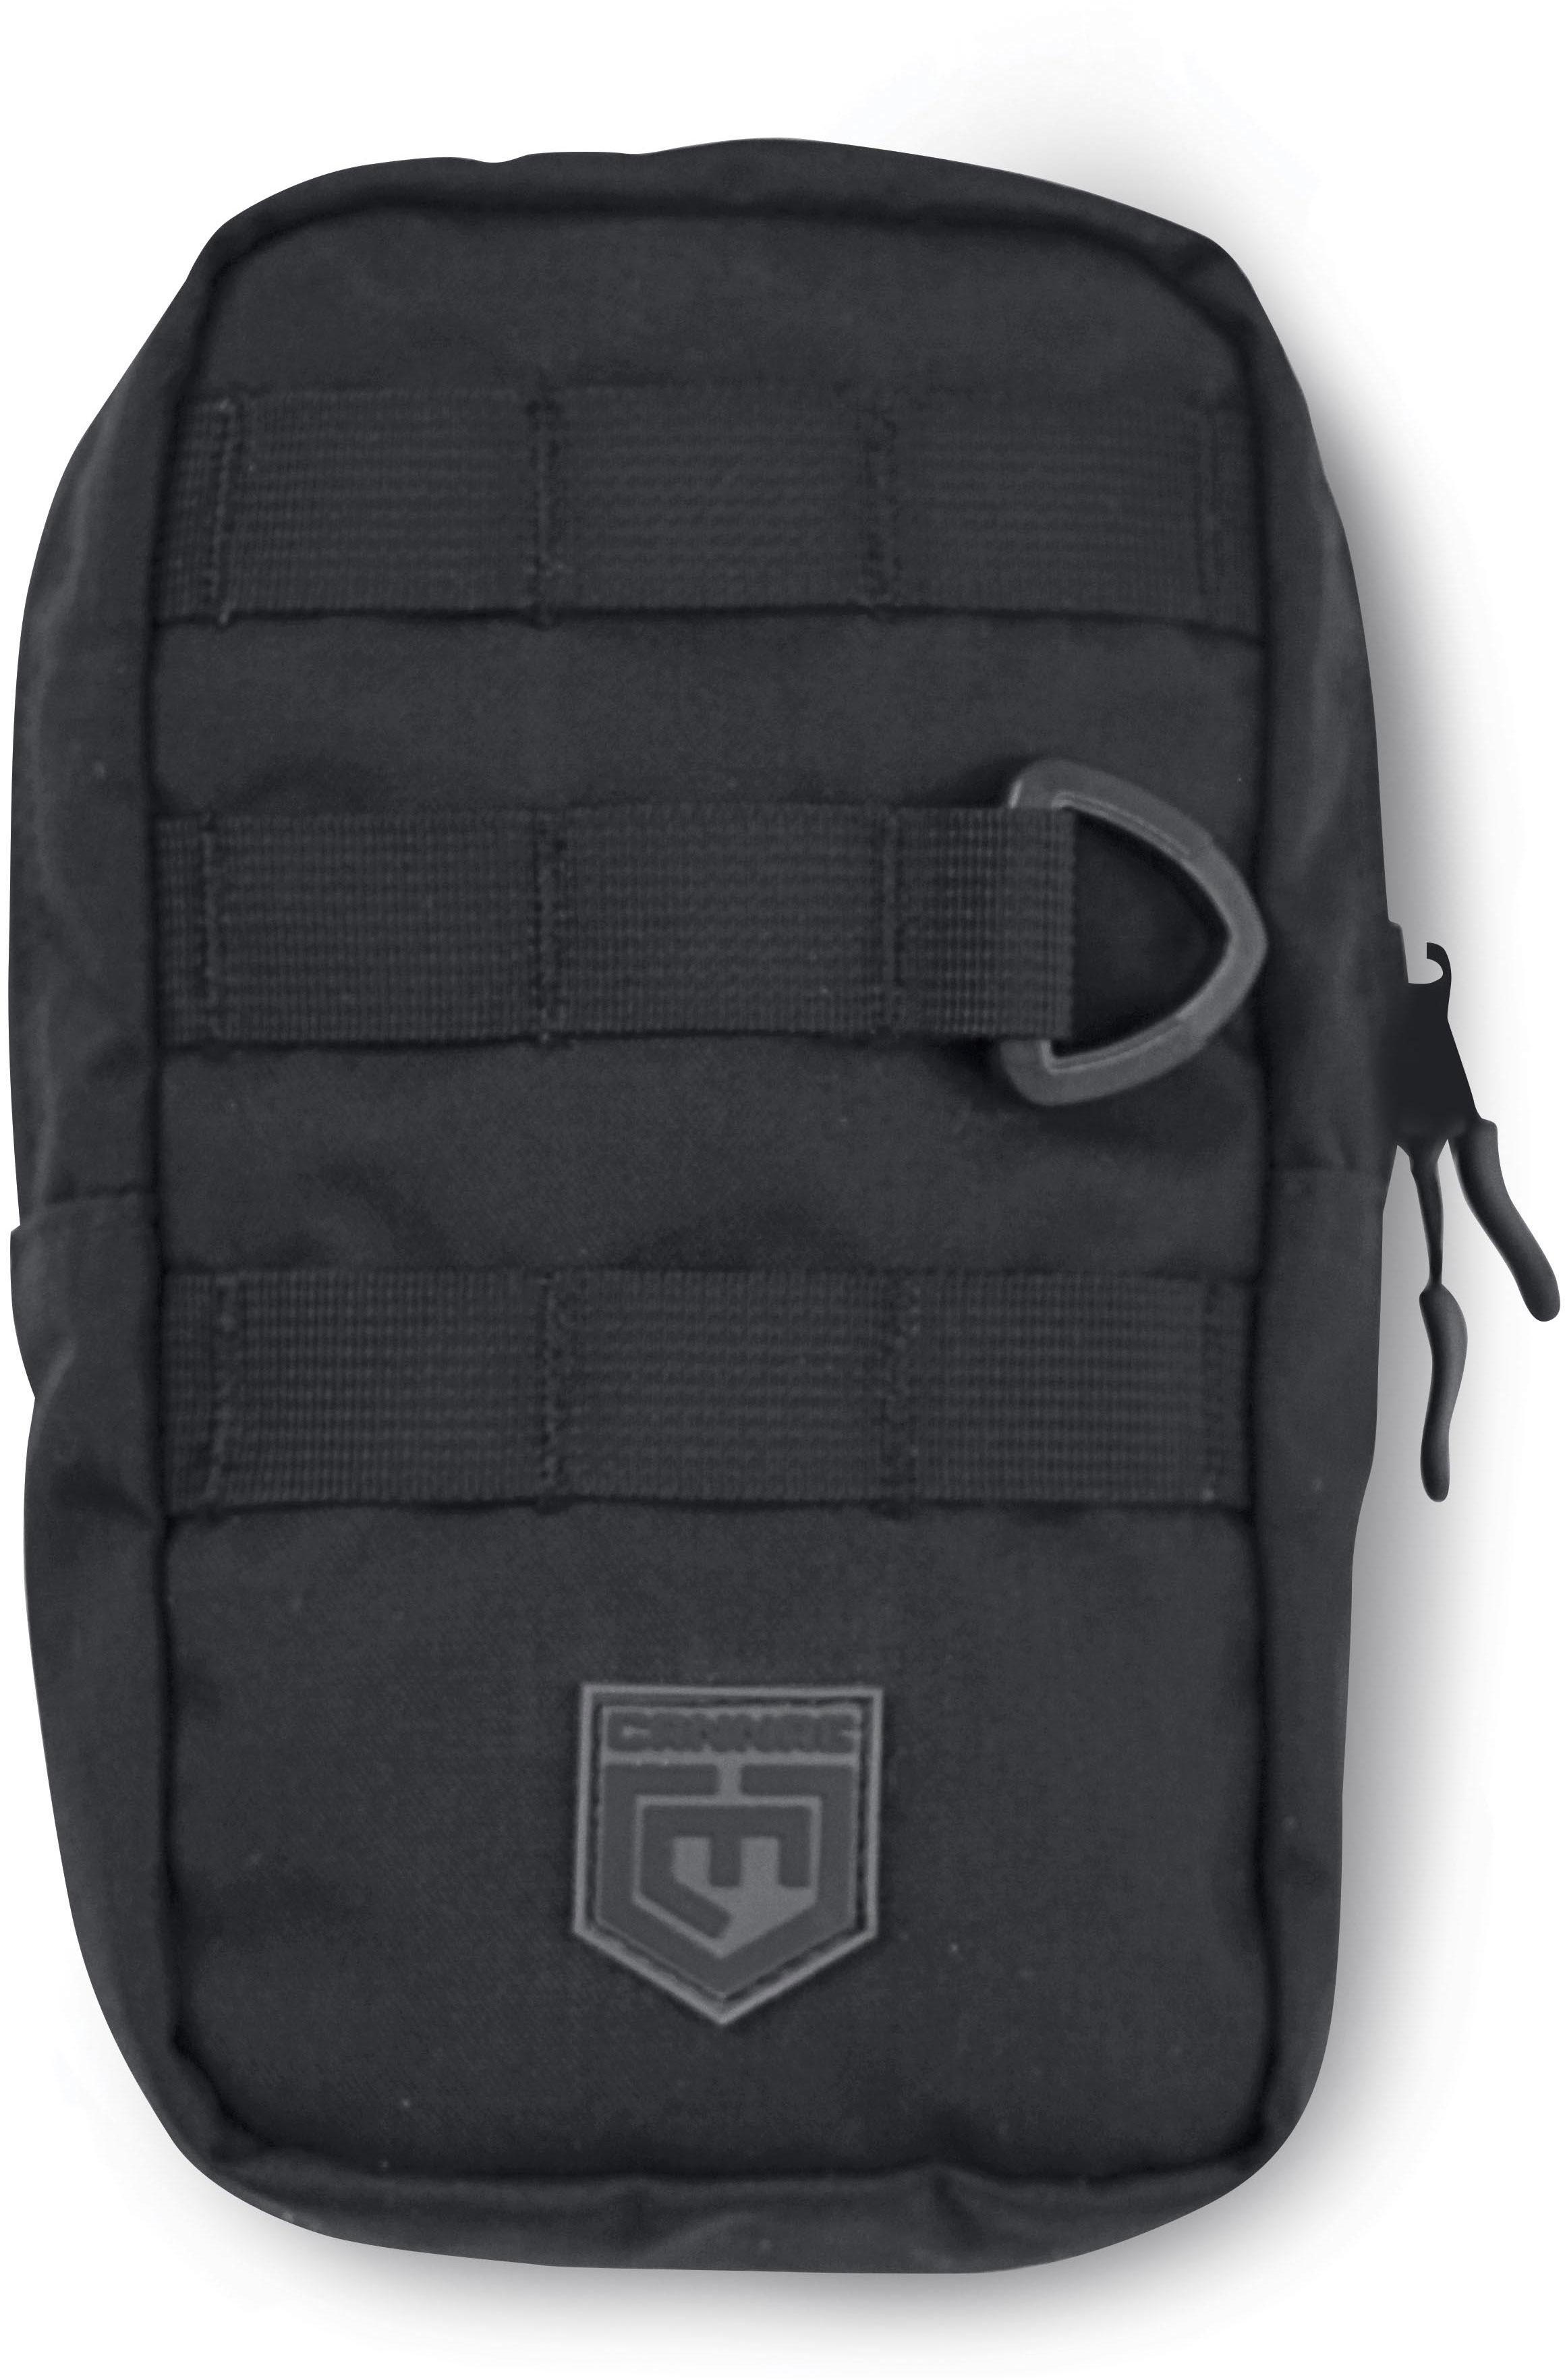 Cannae Pro Gear 9 inch x 6 inch EDC MOLLE Pouch, Black